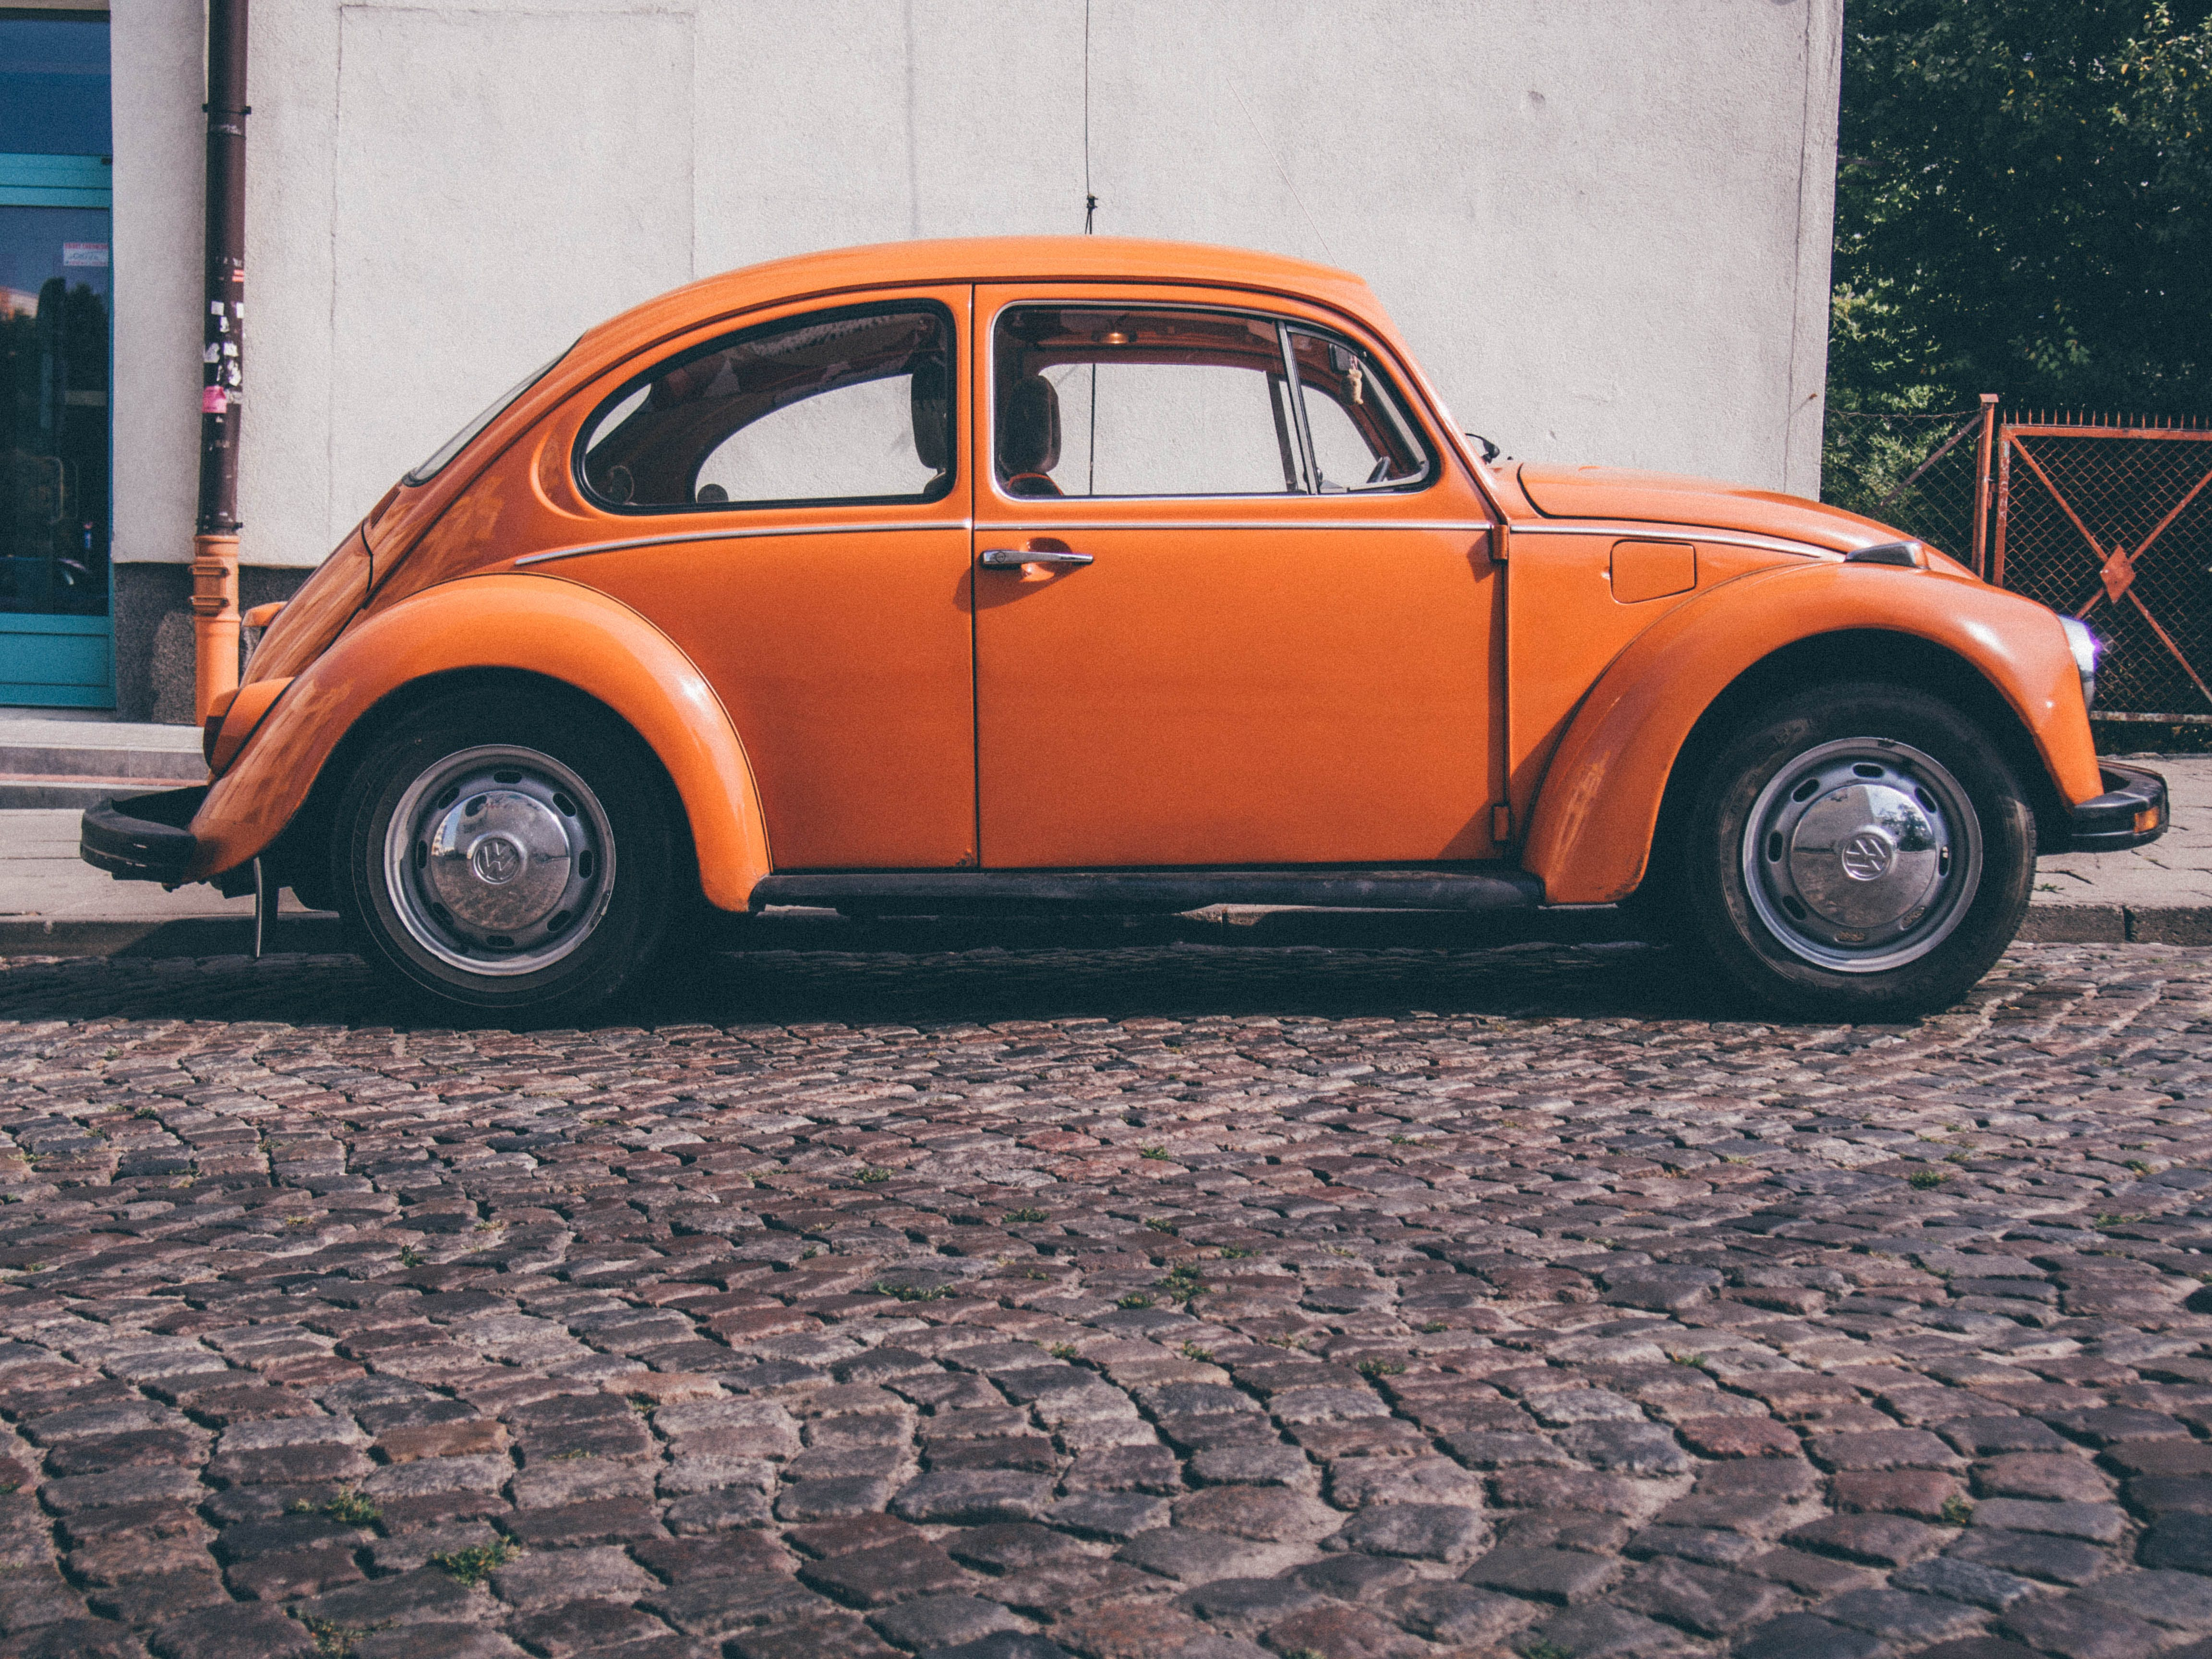 Vintage Orange Car